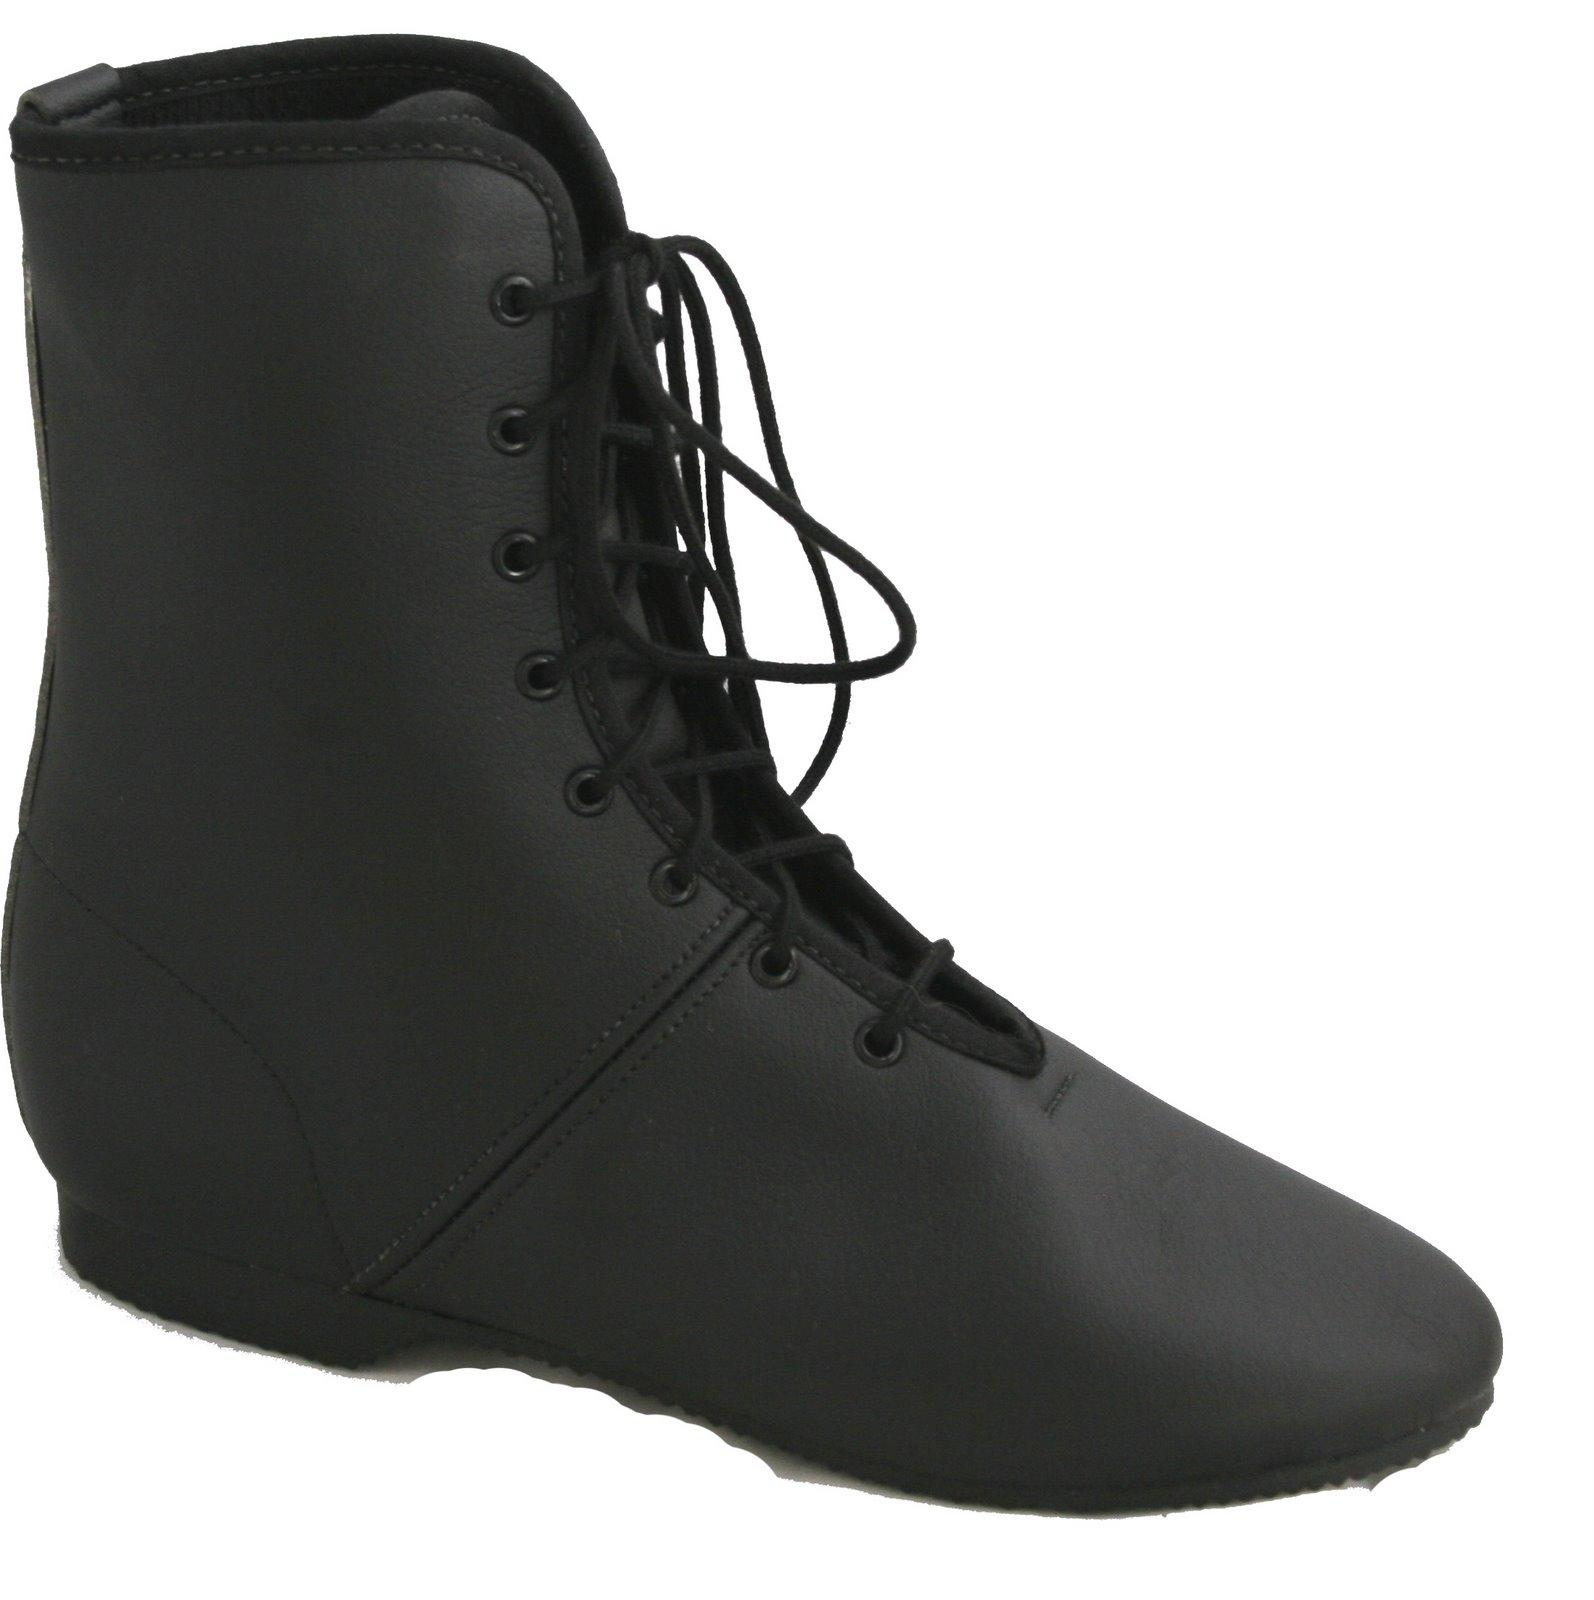 e35f64baff3f4 Pixie Jazz Boot - Dance Like a Vegan